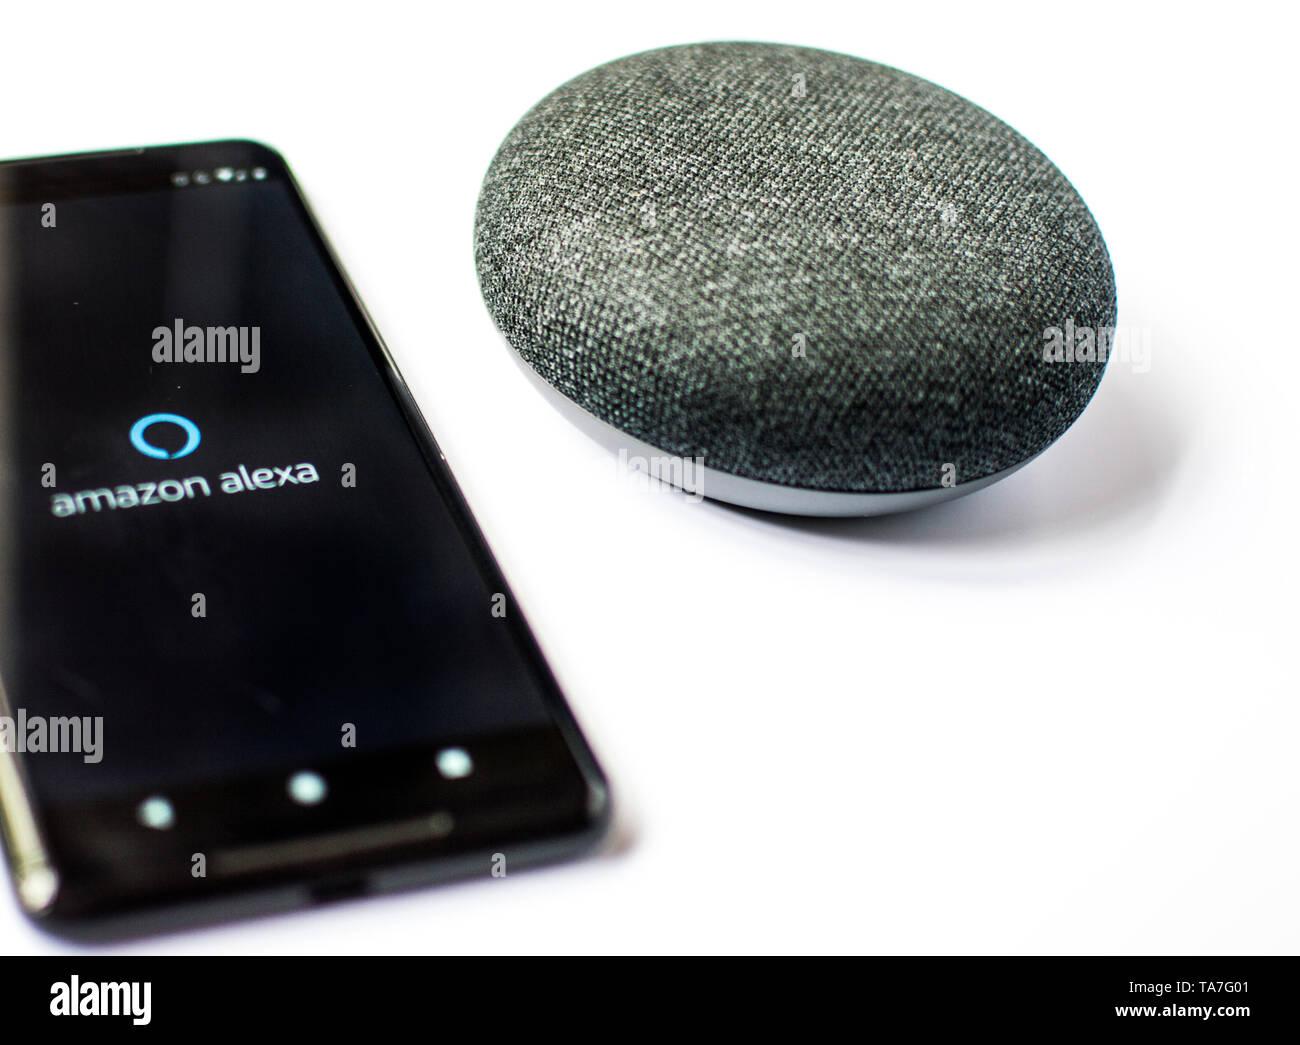 Google Android Robot Stock Photos & Google Android Robot